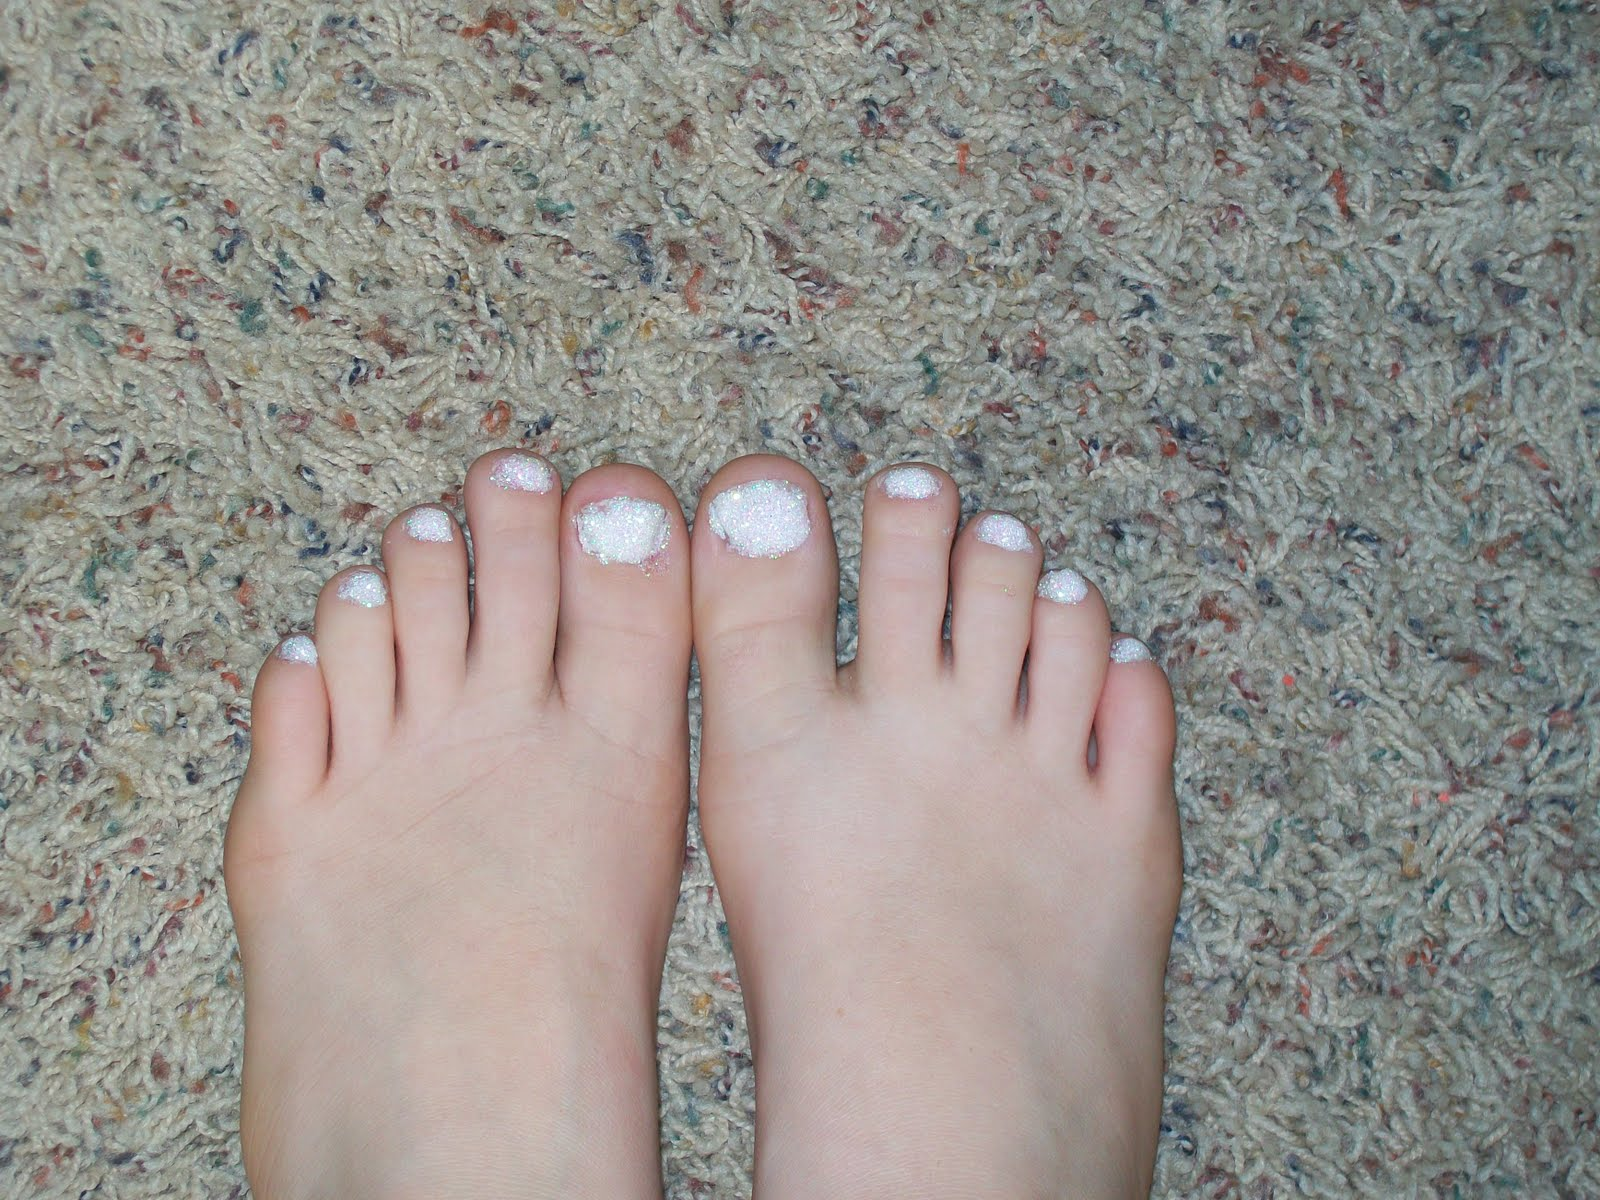 Glitter Toes Utah Glitter Toes One of Haer